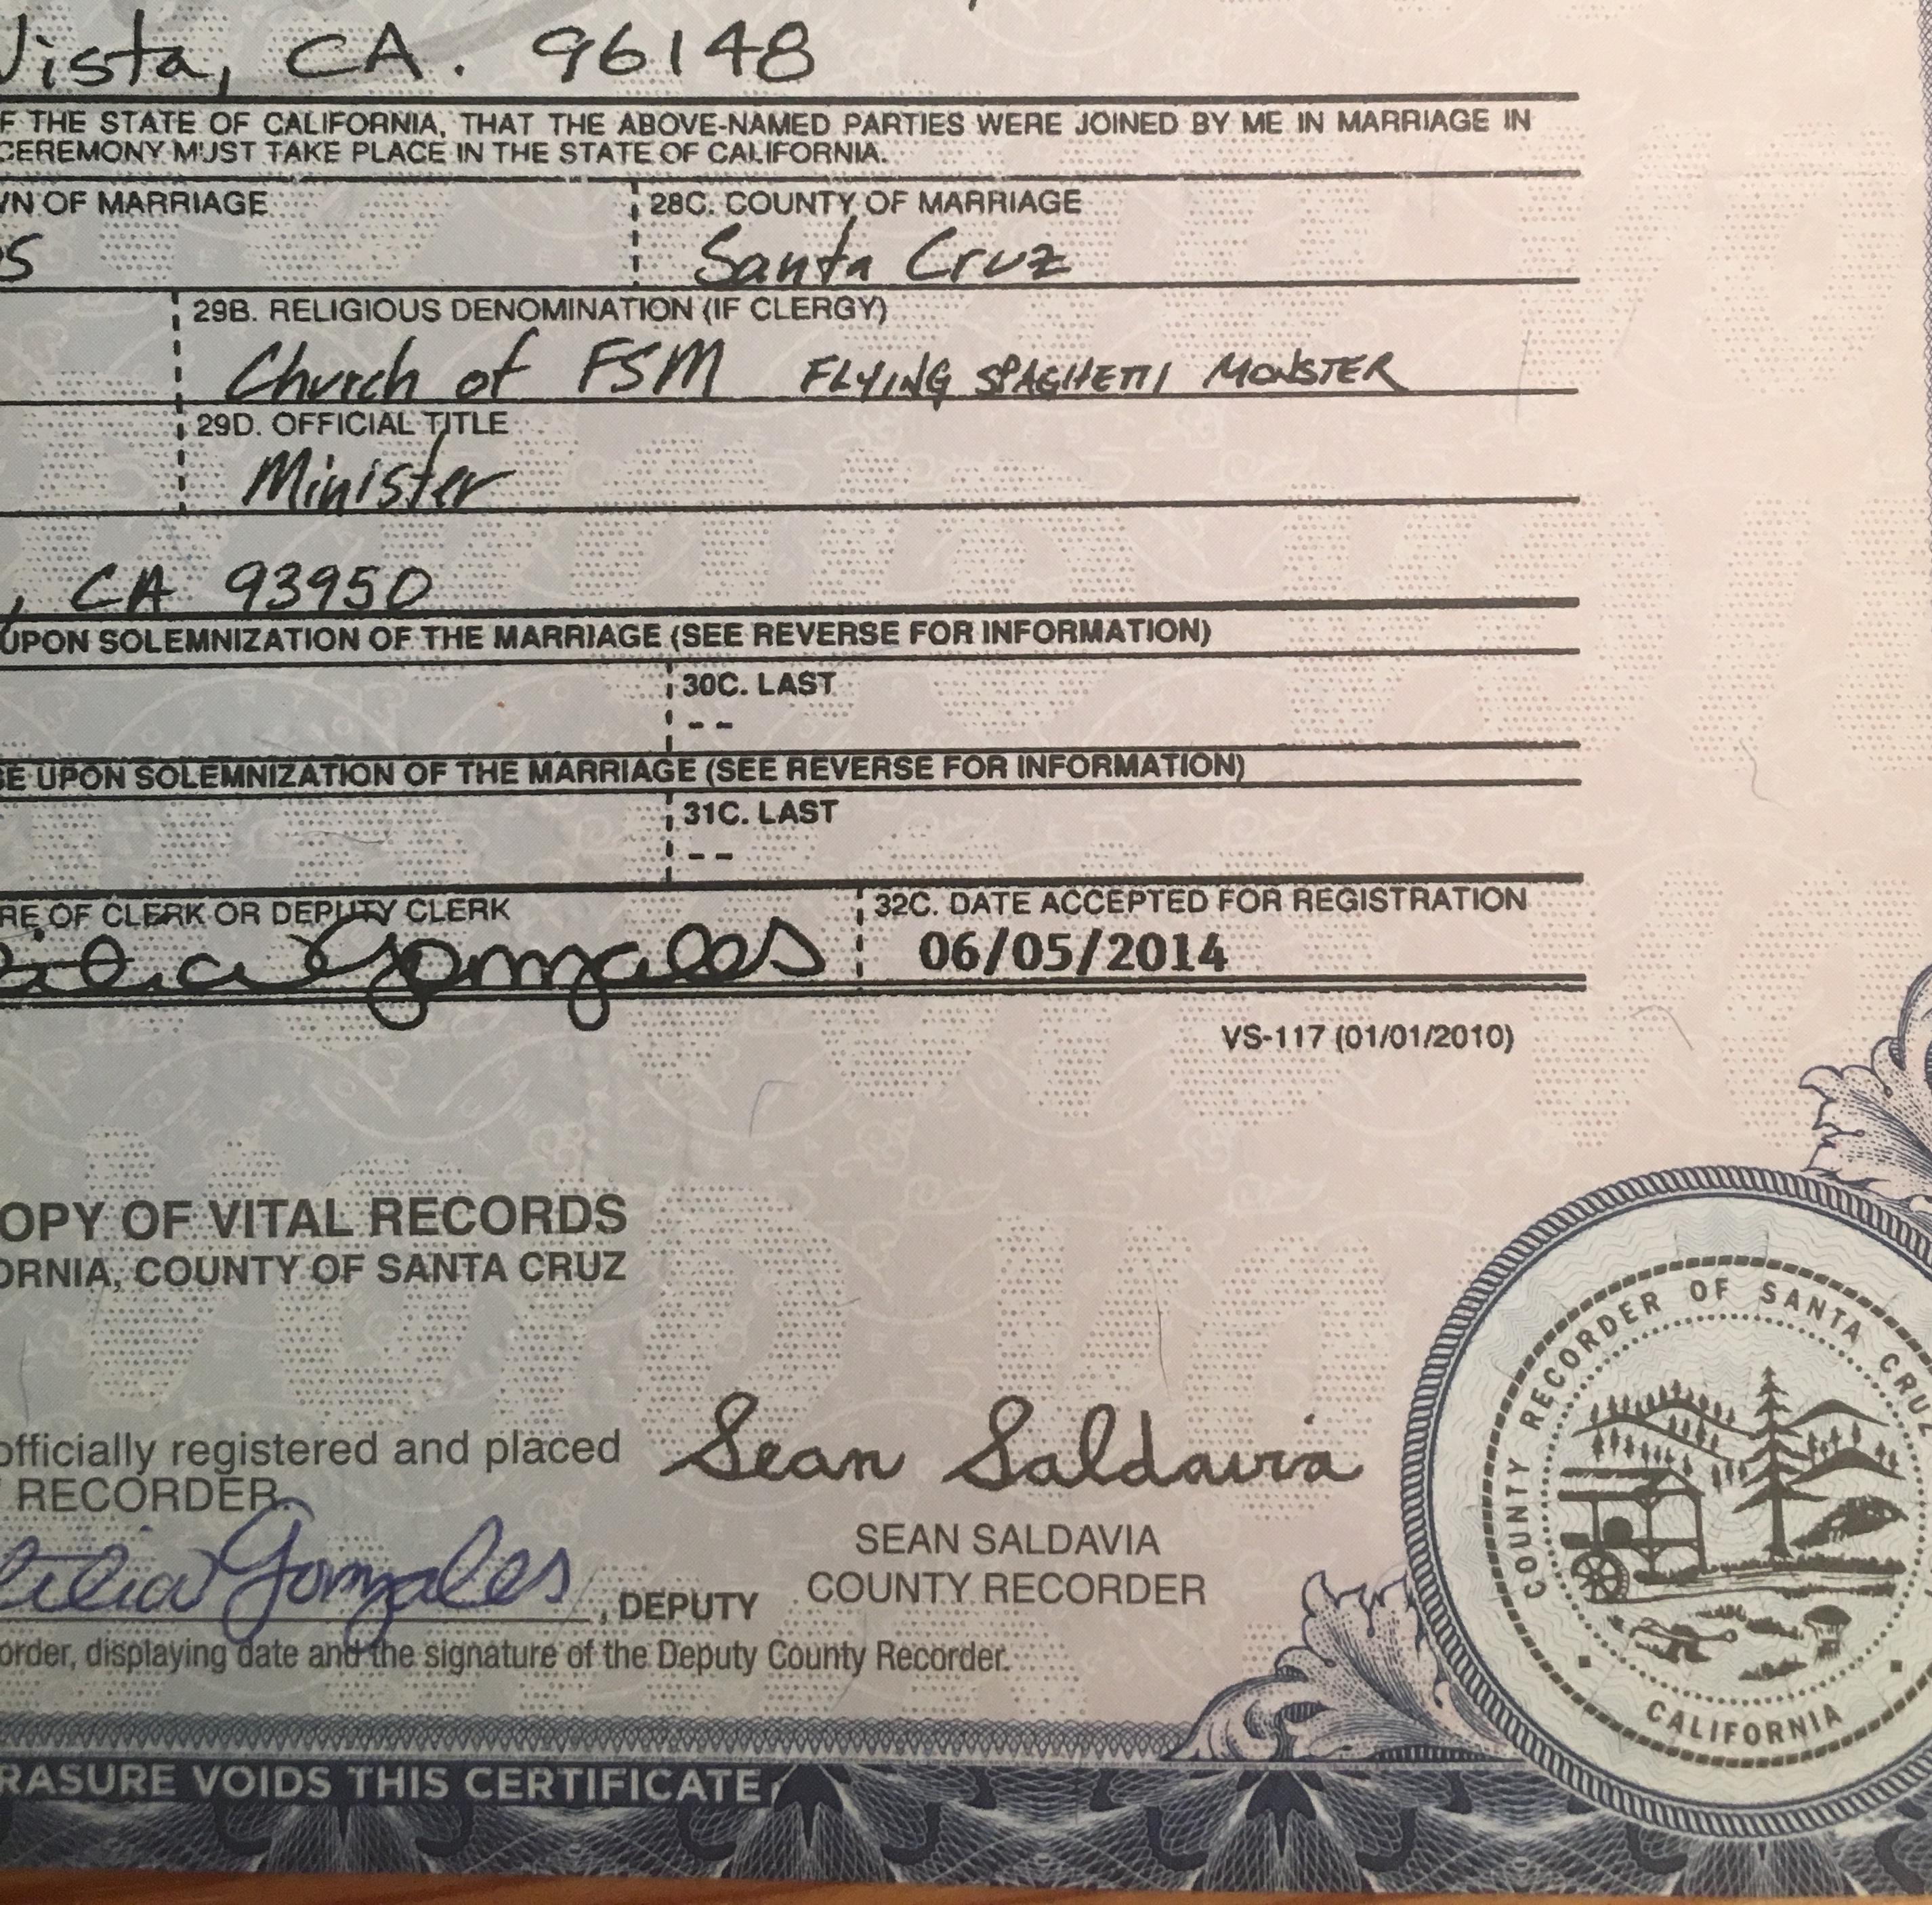 marriage certificate california cruz santa